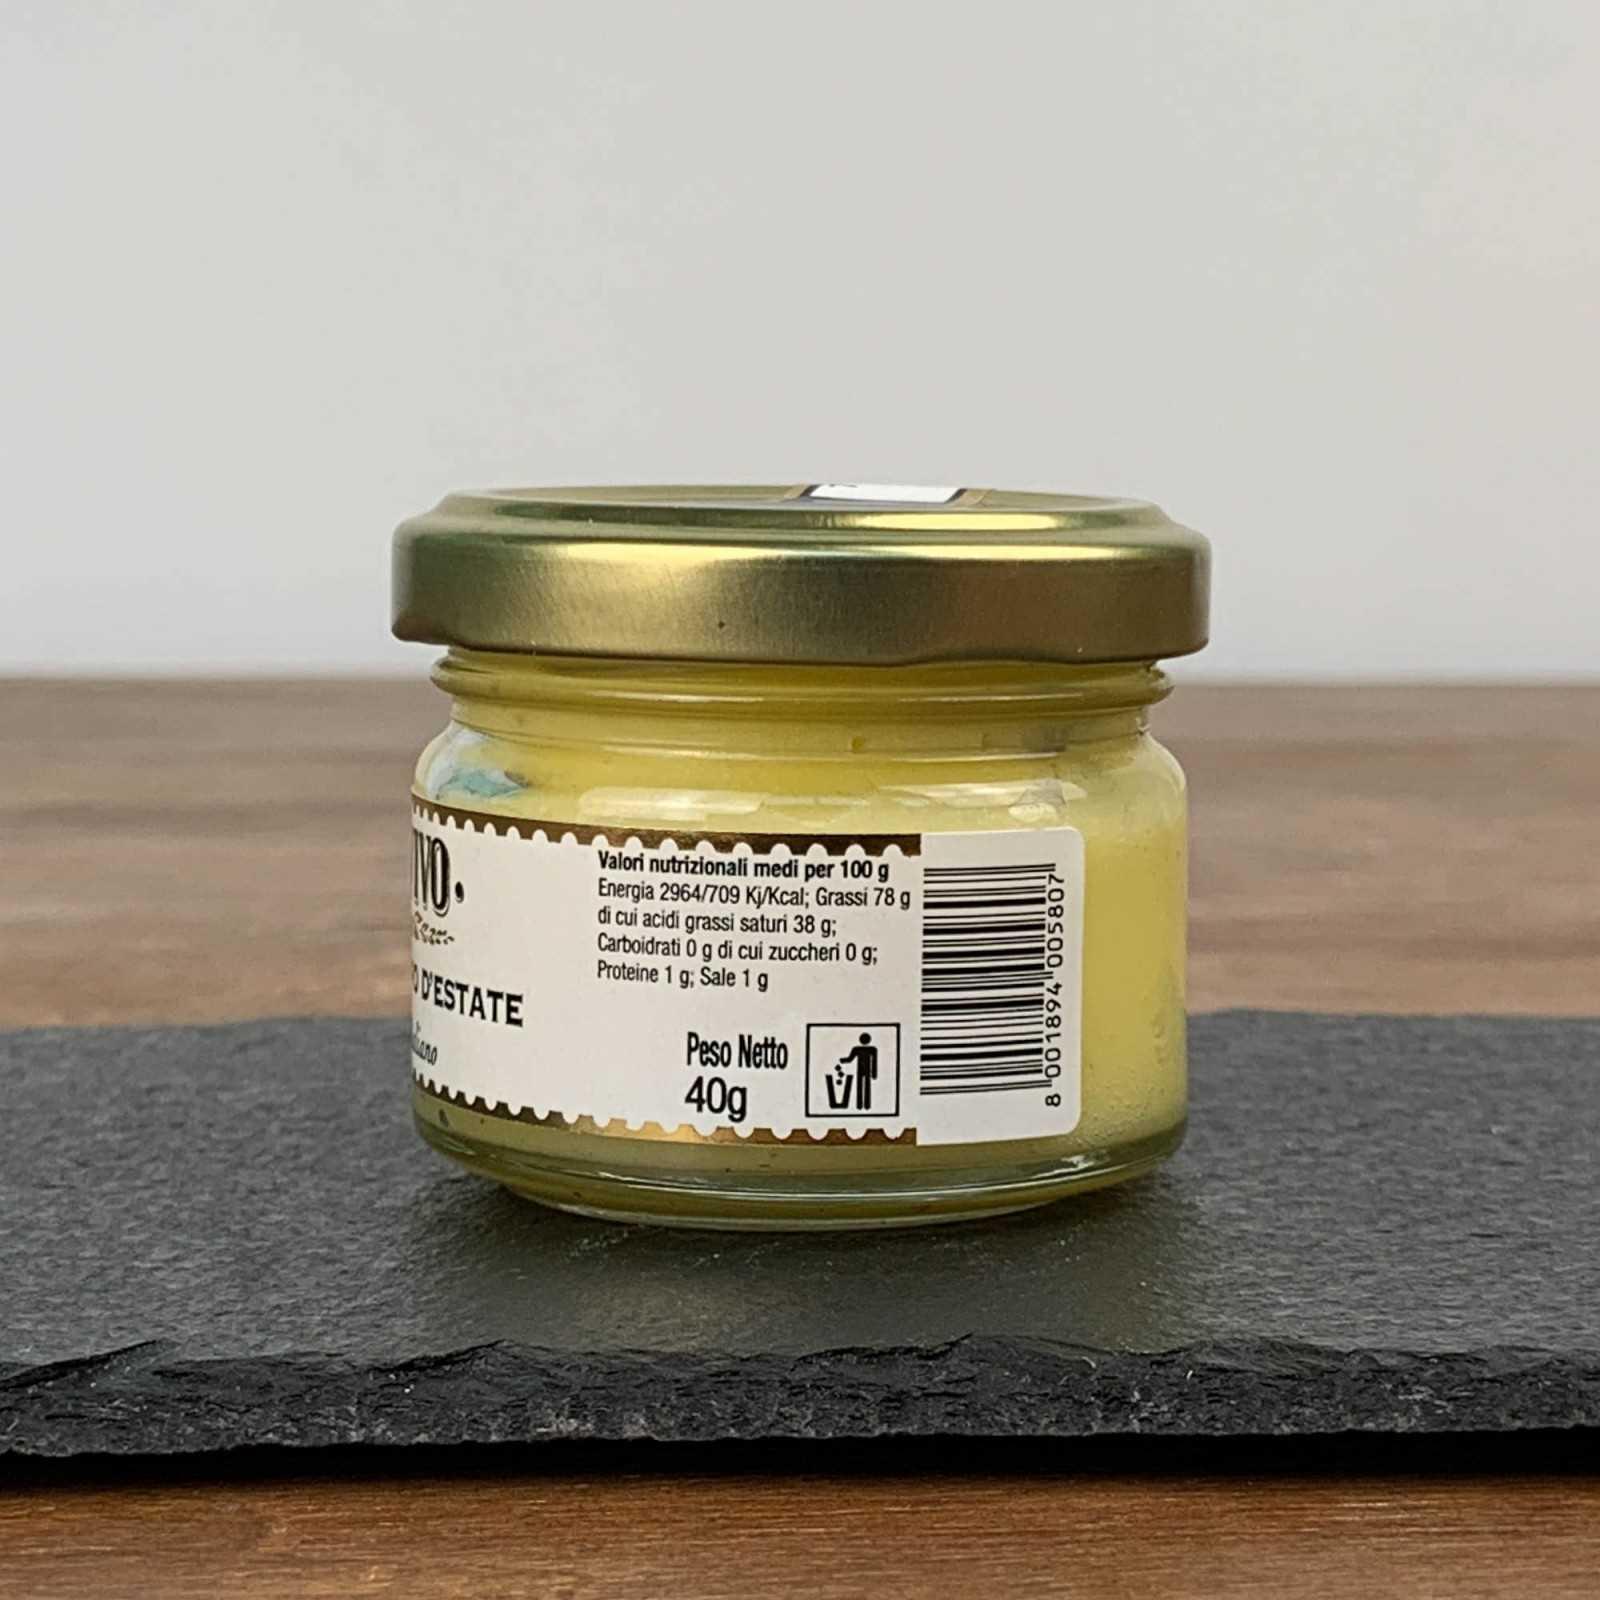 Schwarzer Sommer Trüffelbutter - Tuber Aestivum Vitt. - 100% Italienisch.